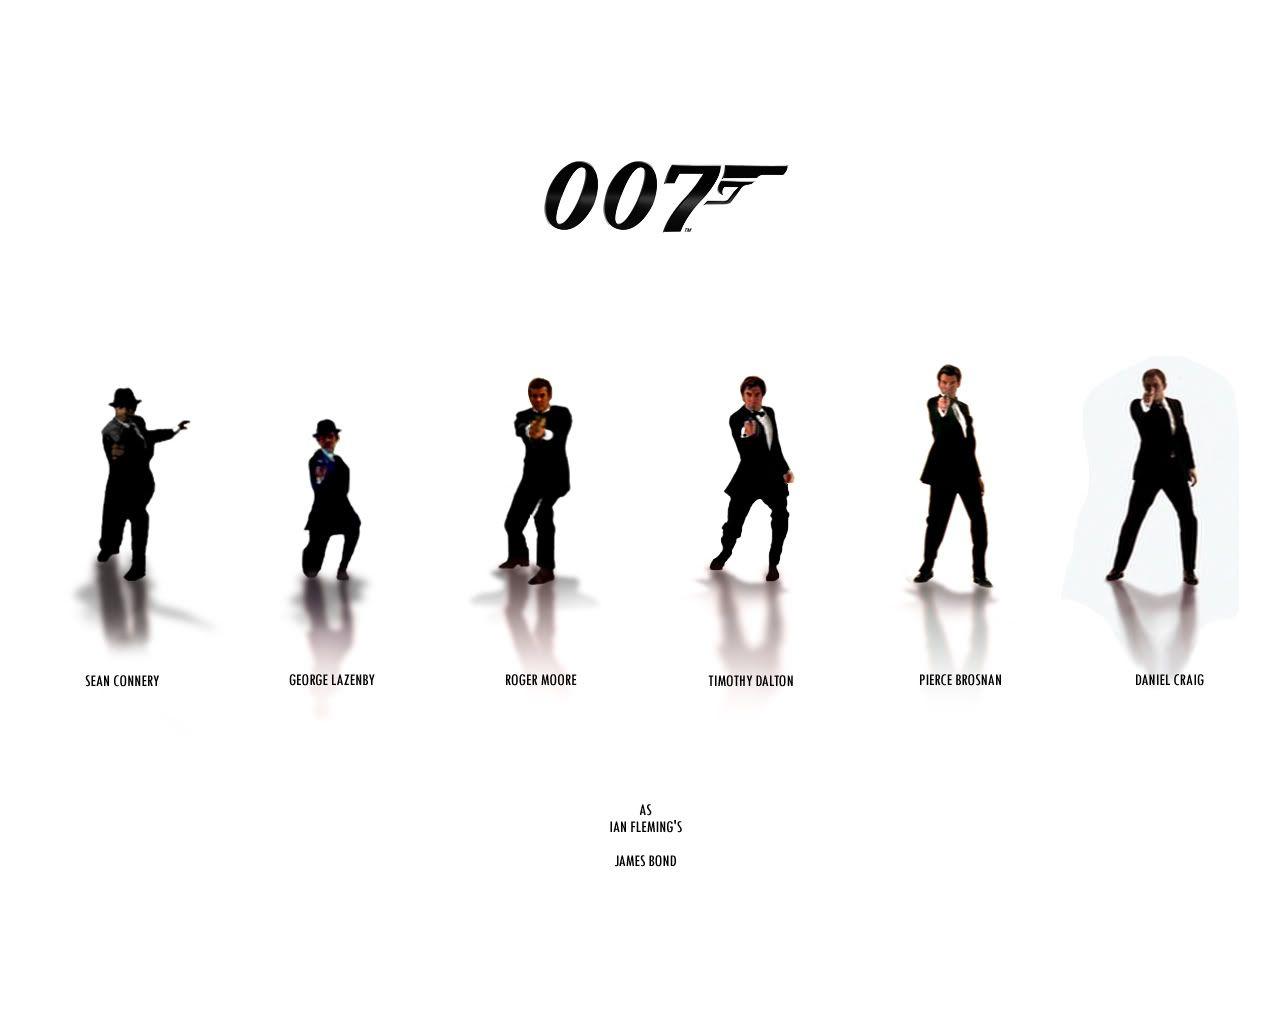 007 S Evolution 3650 Good Wallpapers Com James Bond James Bond Movies James Bond Movie Posters